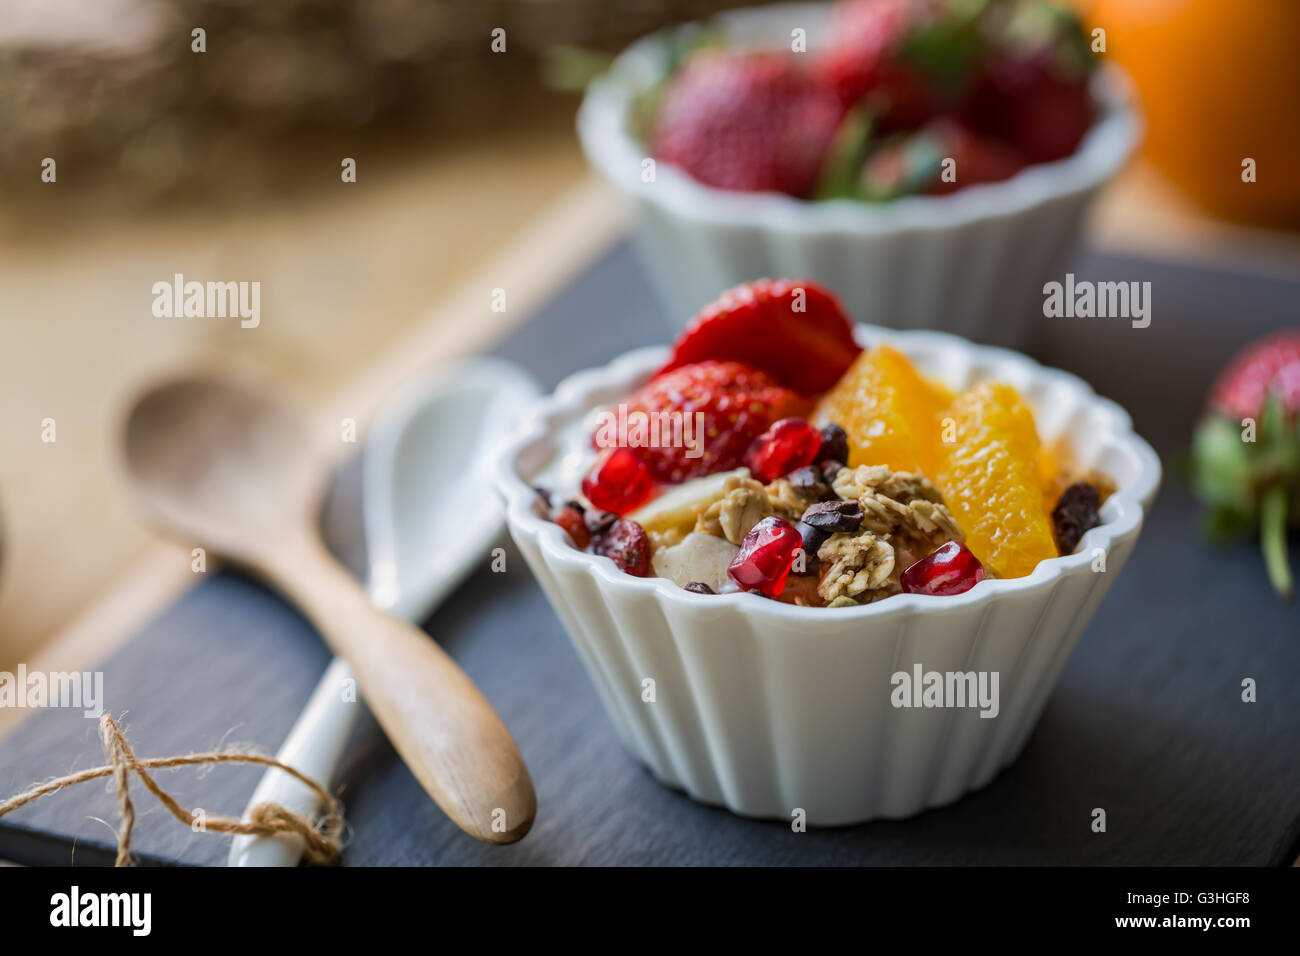 Granola with Orange, Strawberry, Cacao nibs and Pomegranate on yogurt - Stock Image